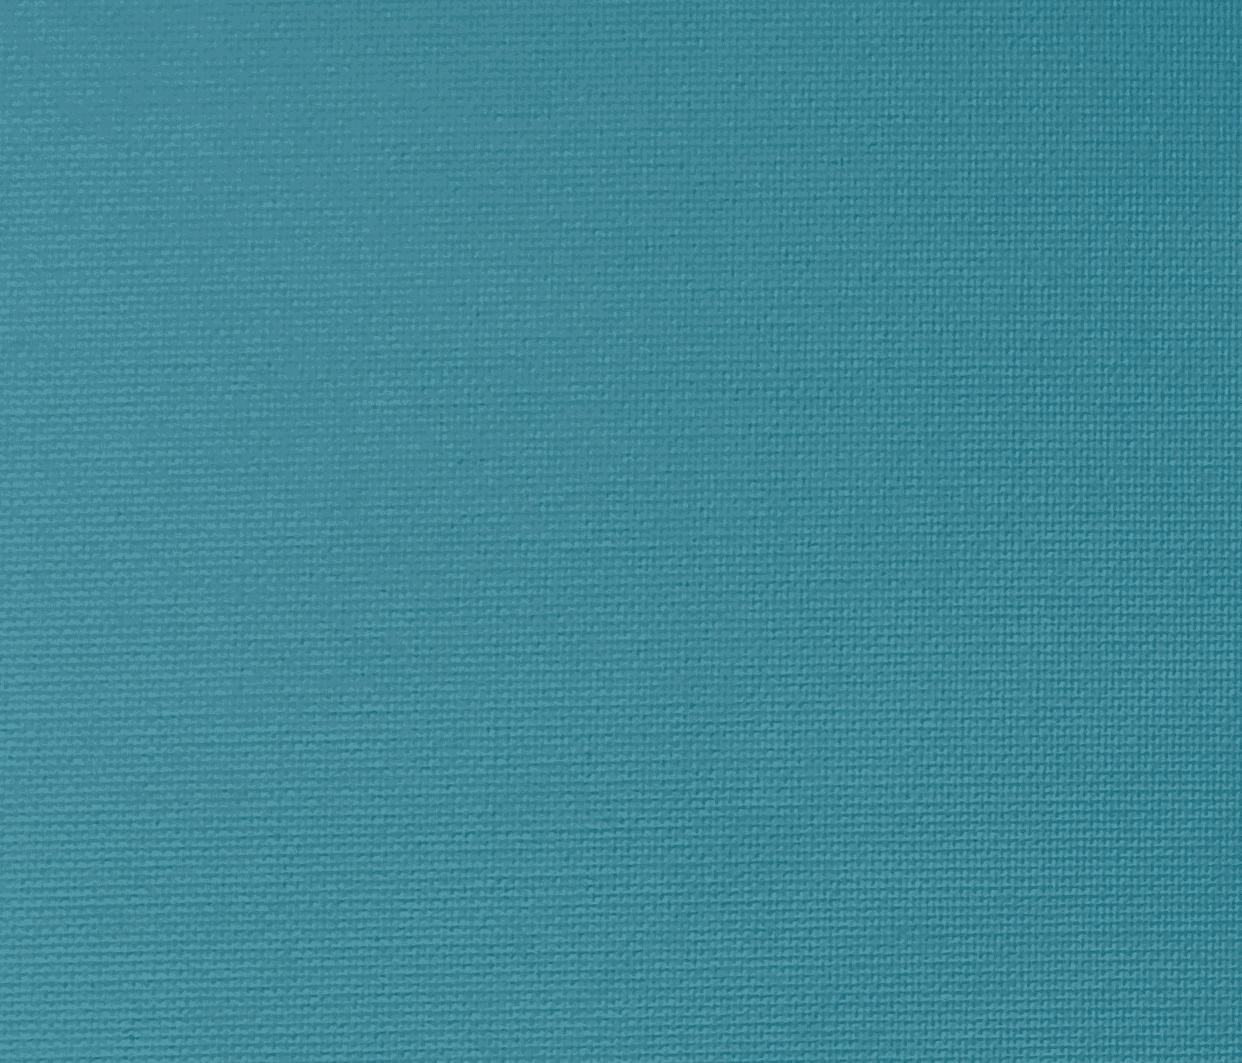 Eden Turquoise Blind Fabric